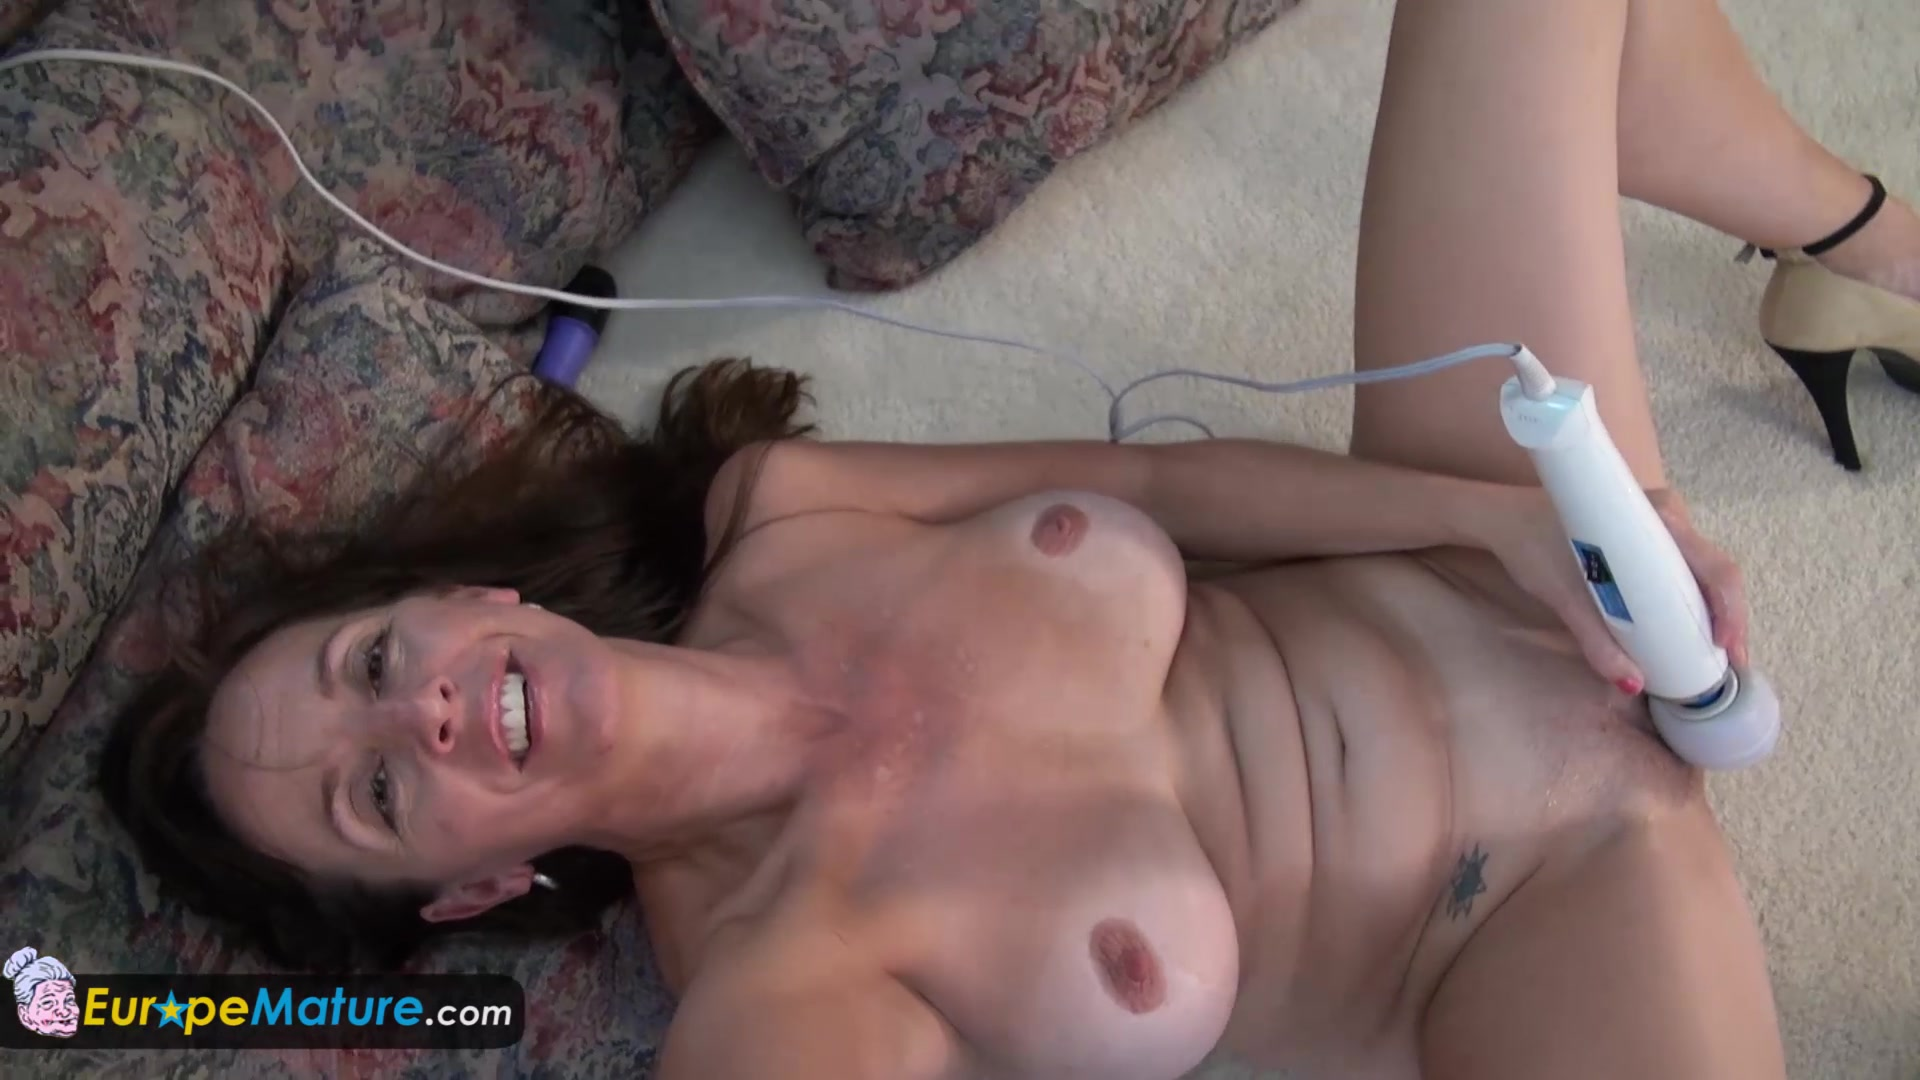 Hot xXx Video Best way to get over a man